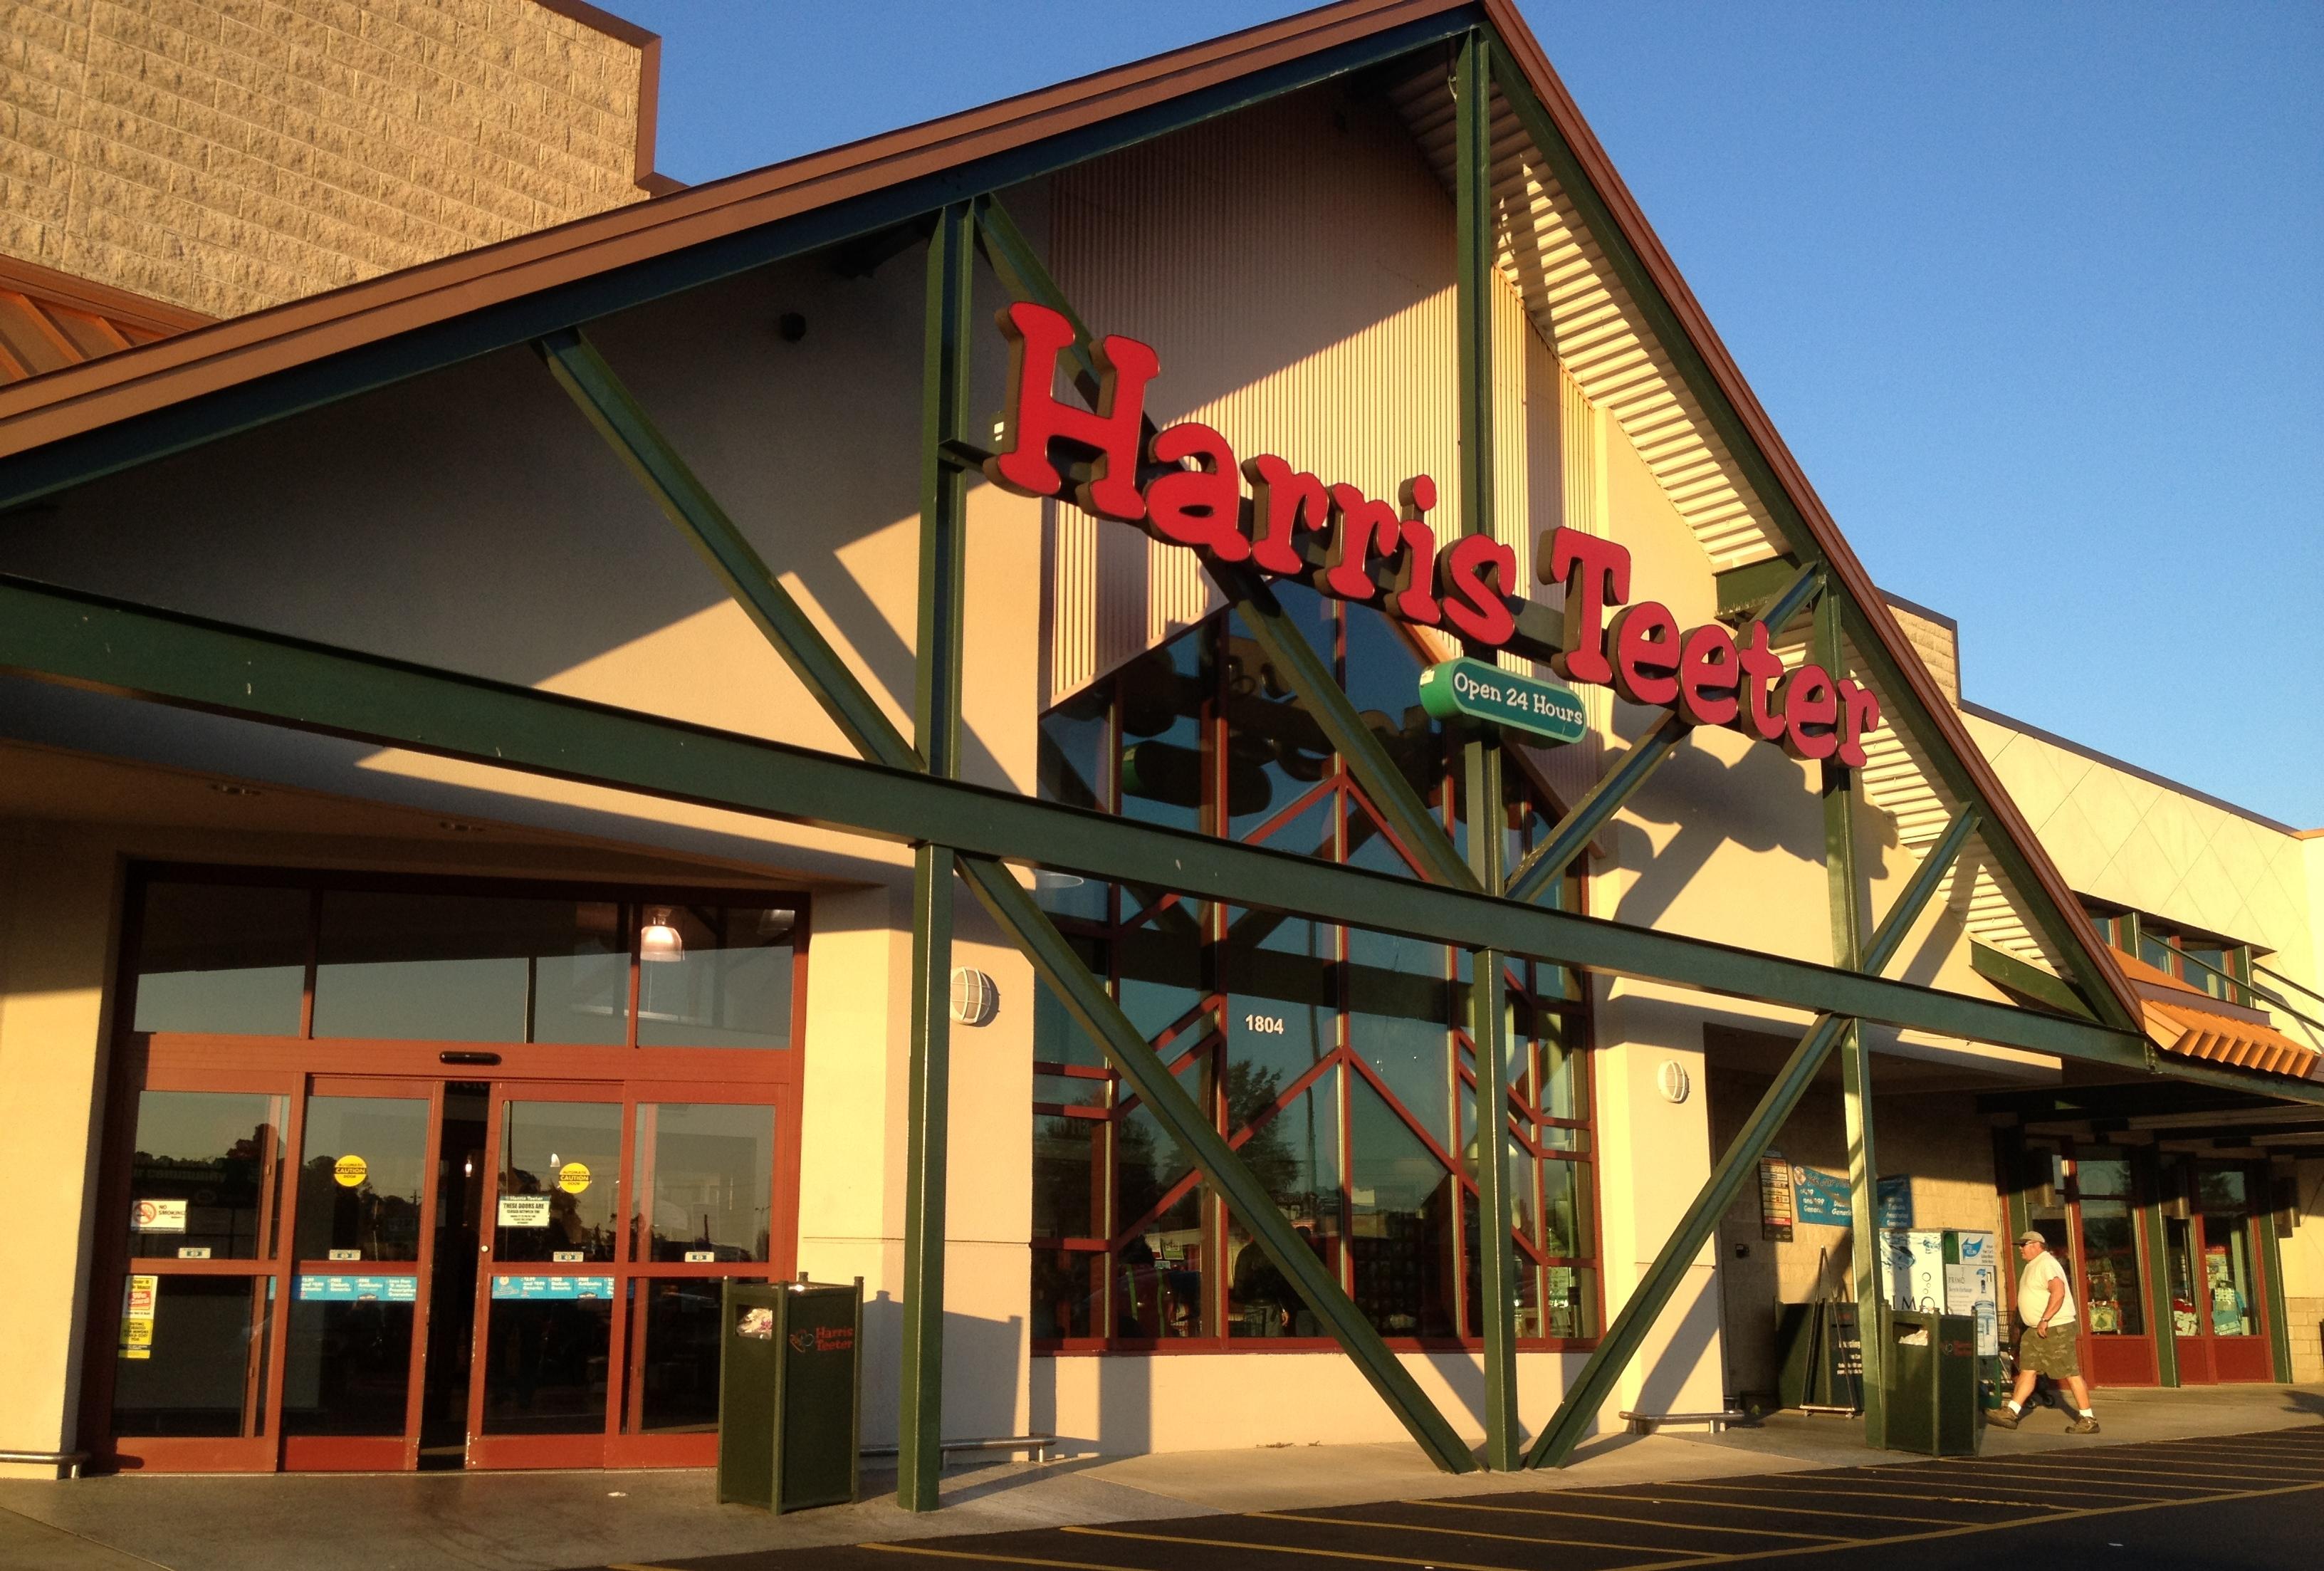 Harris Teeter Pharmacy Virginia Beach Blvd